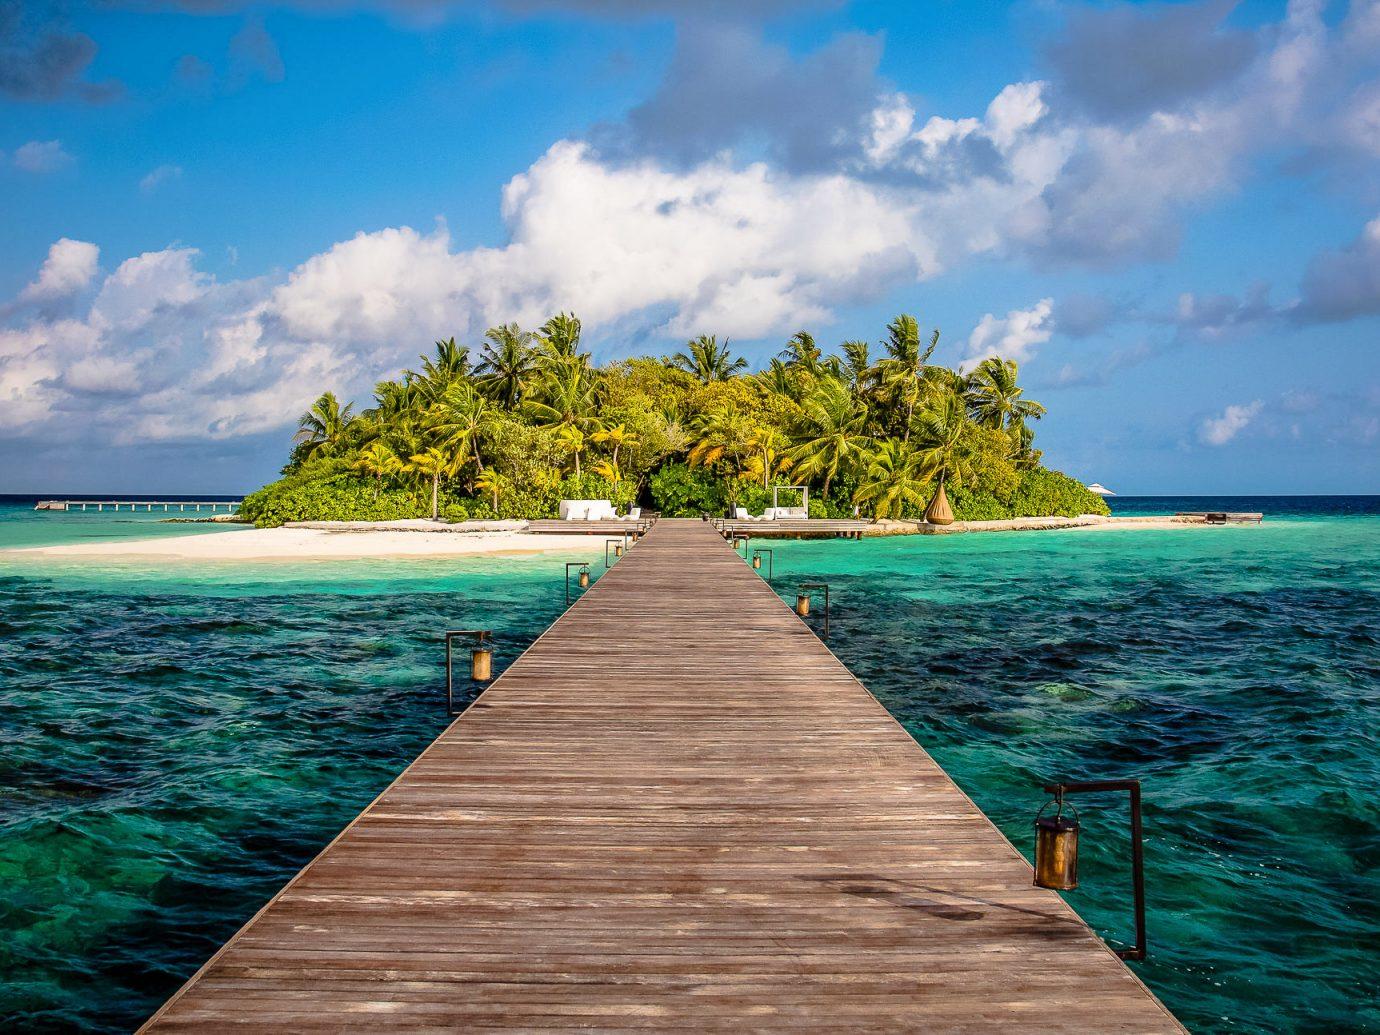 VIew of the Island Coco Prive in the Maldives